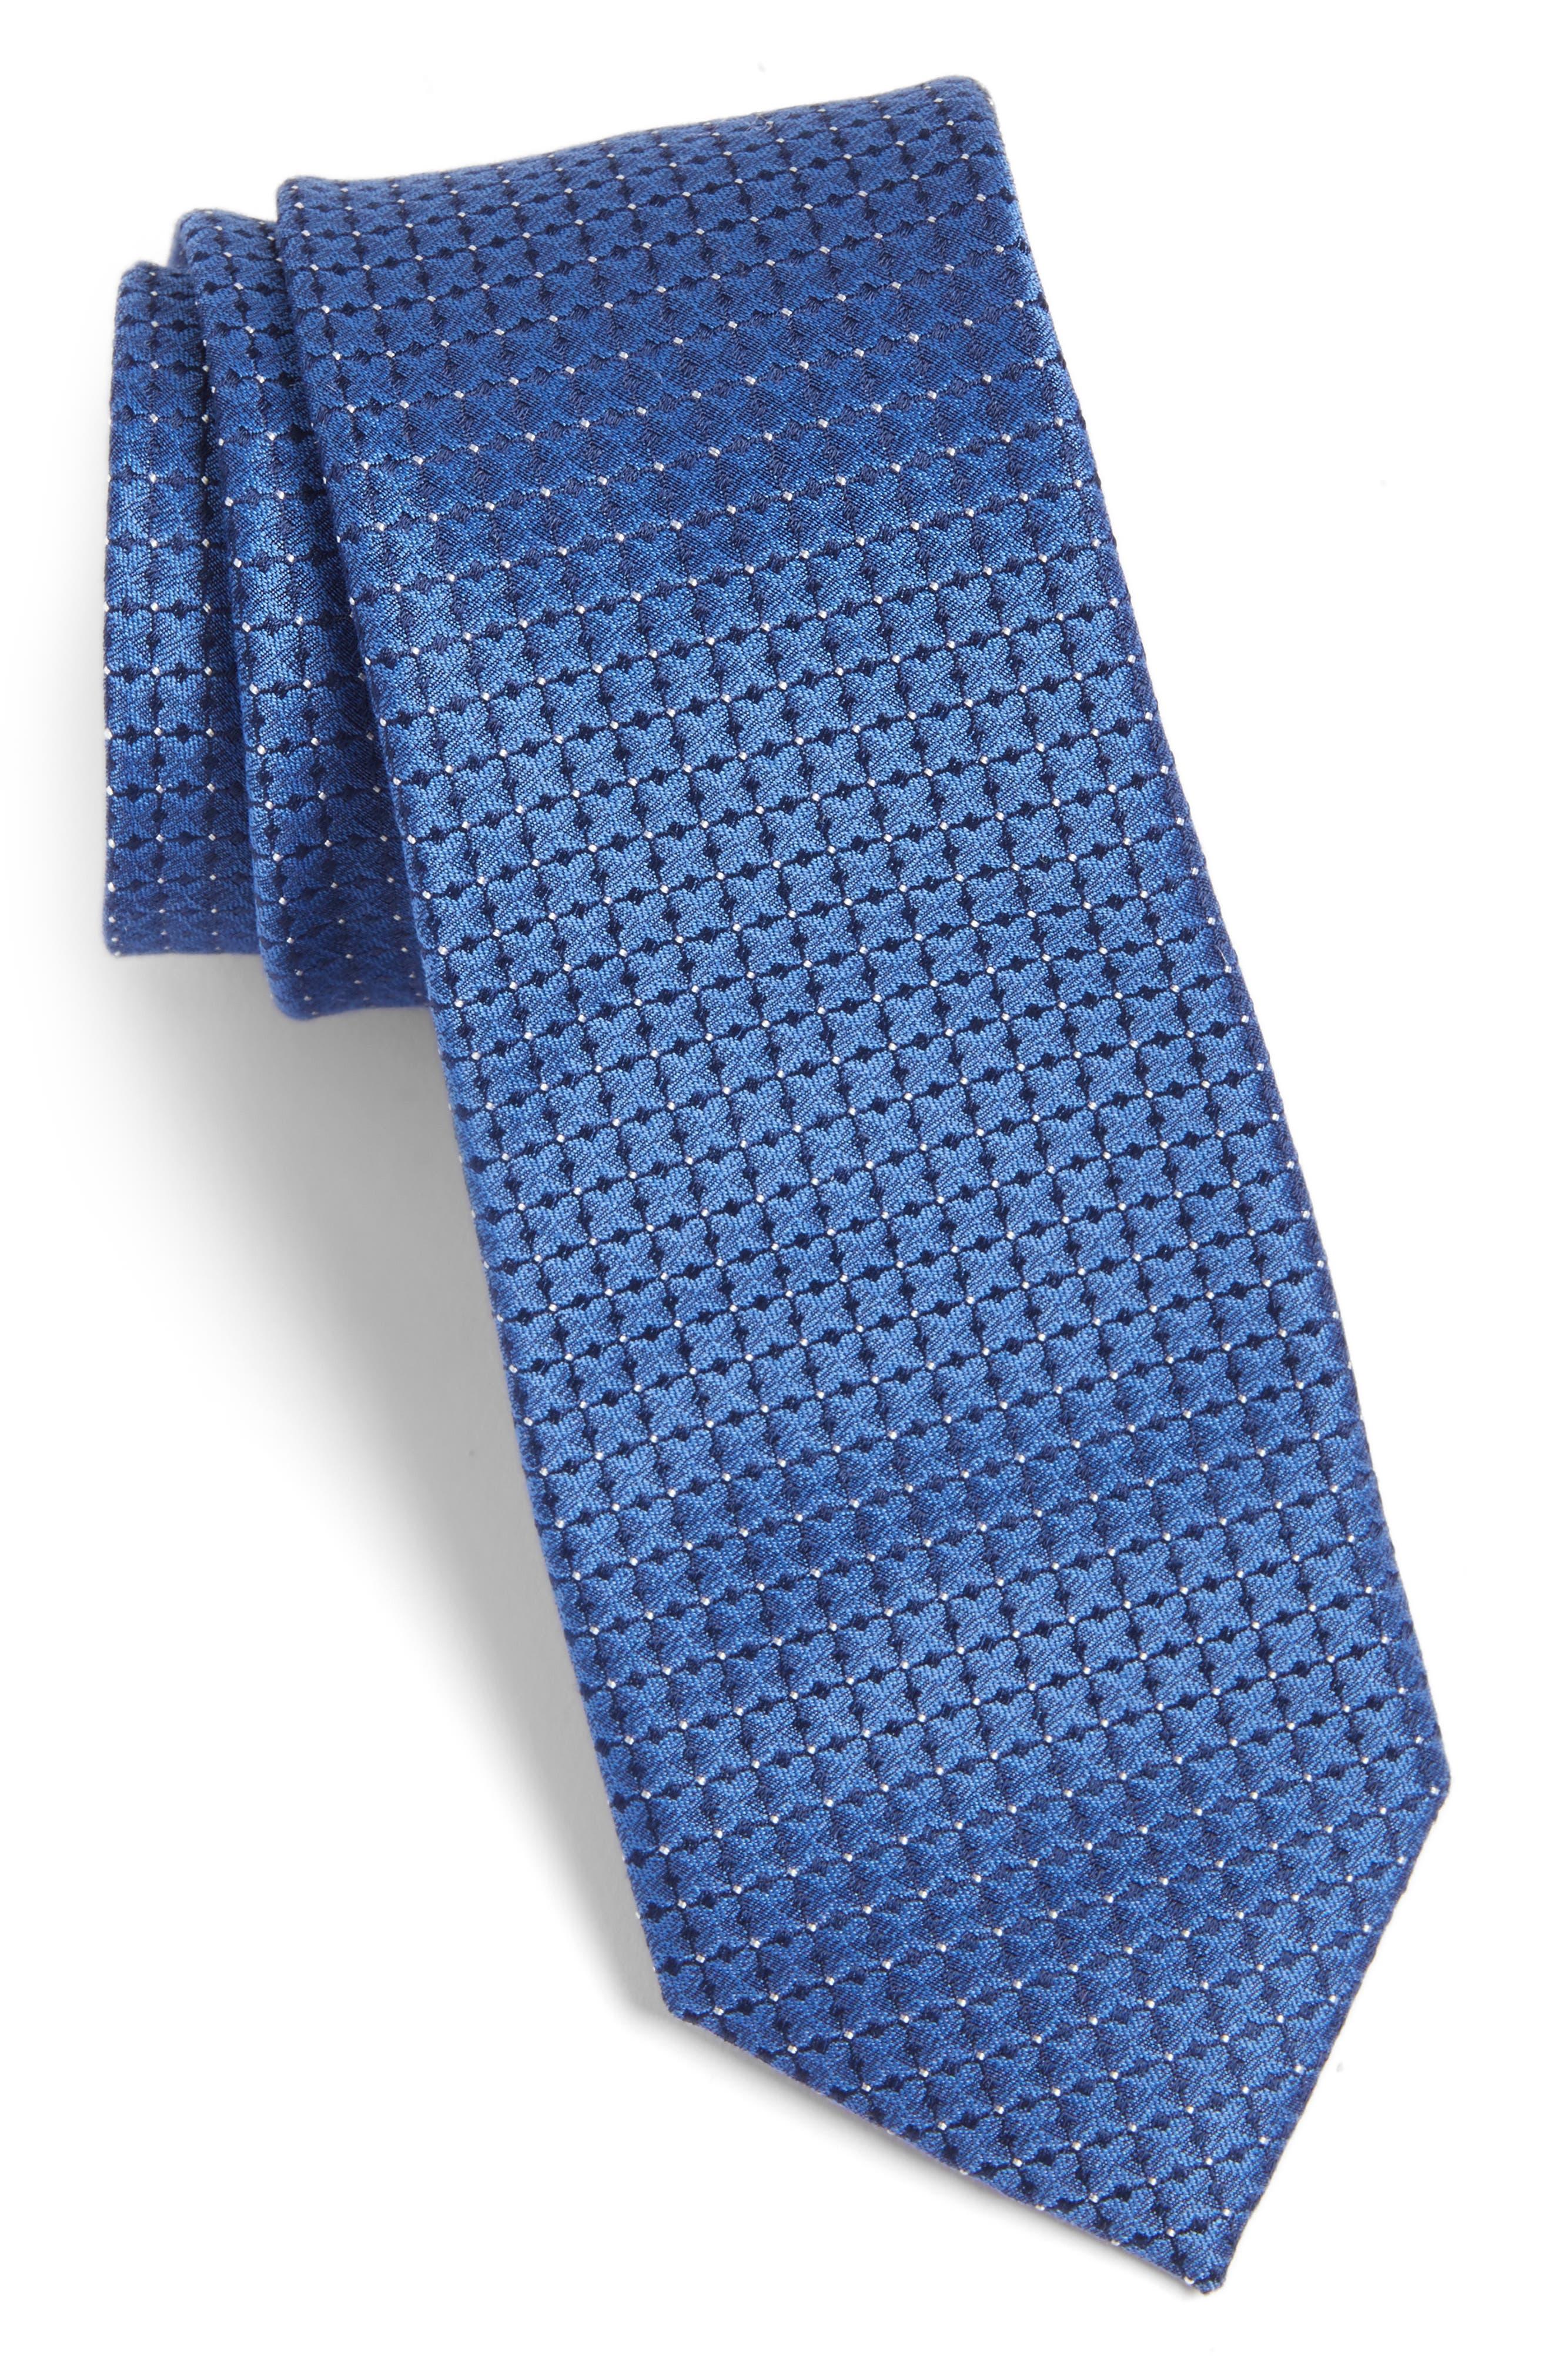 Gower Check Cotton & Silk Tie,                             Main thumbnail 1, color,                             400